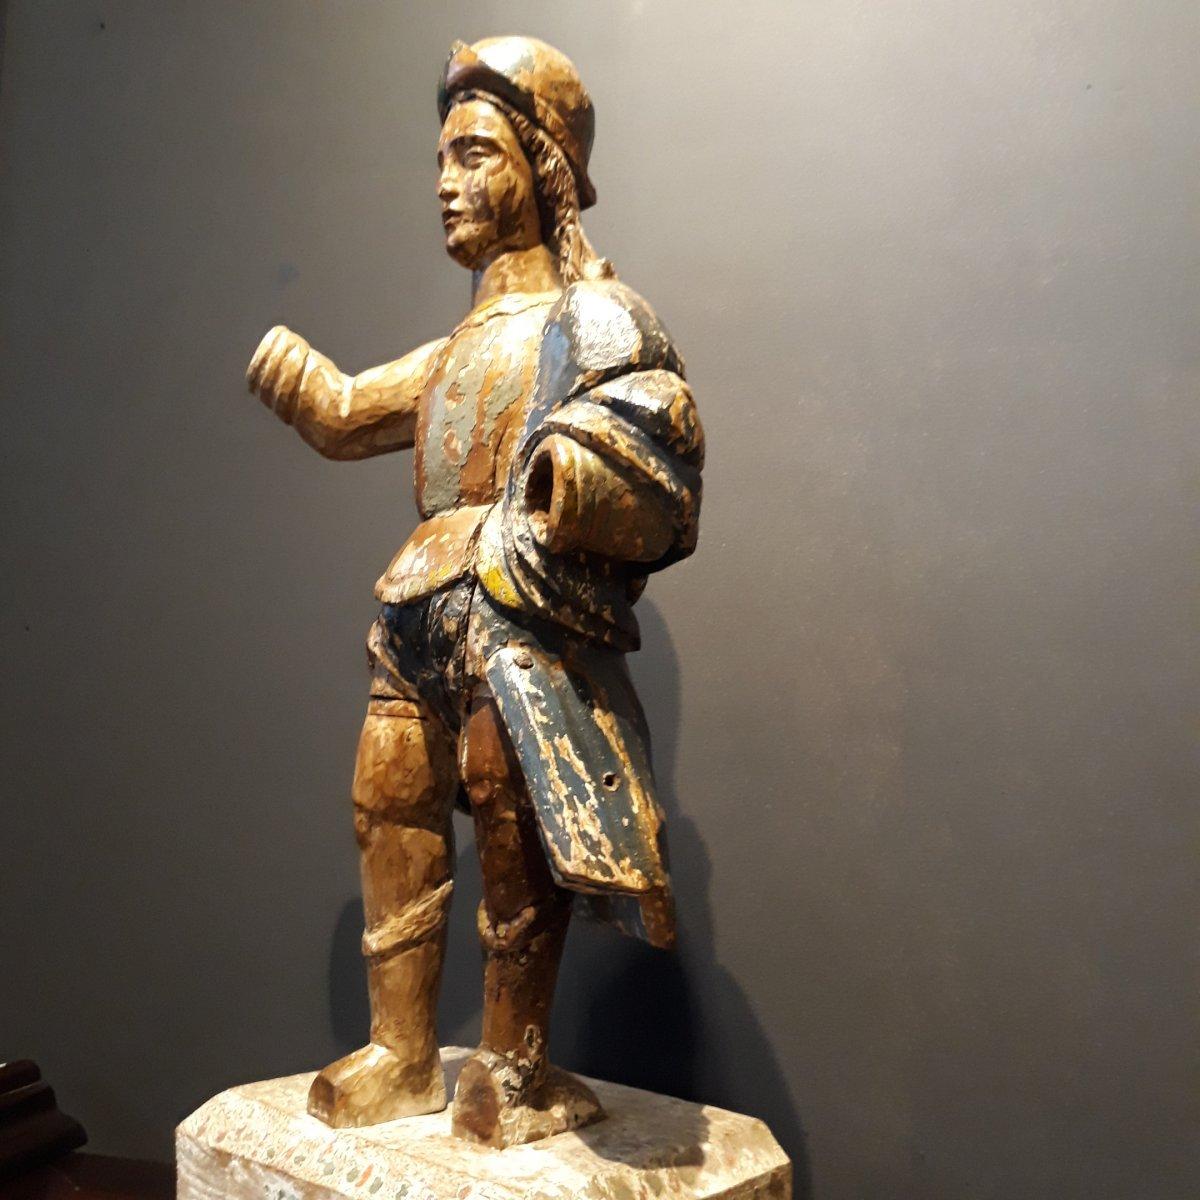 Sculpture Espagnole d'Un Conquistador